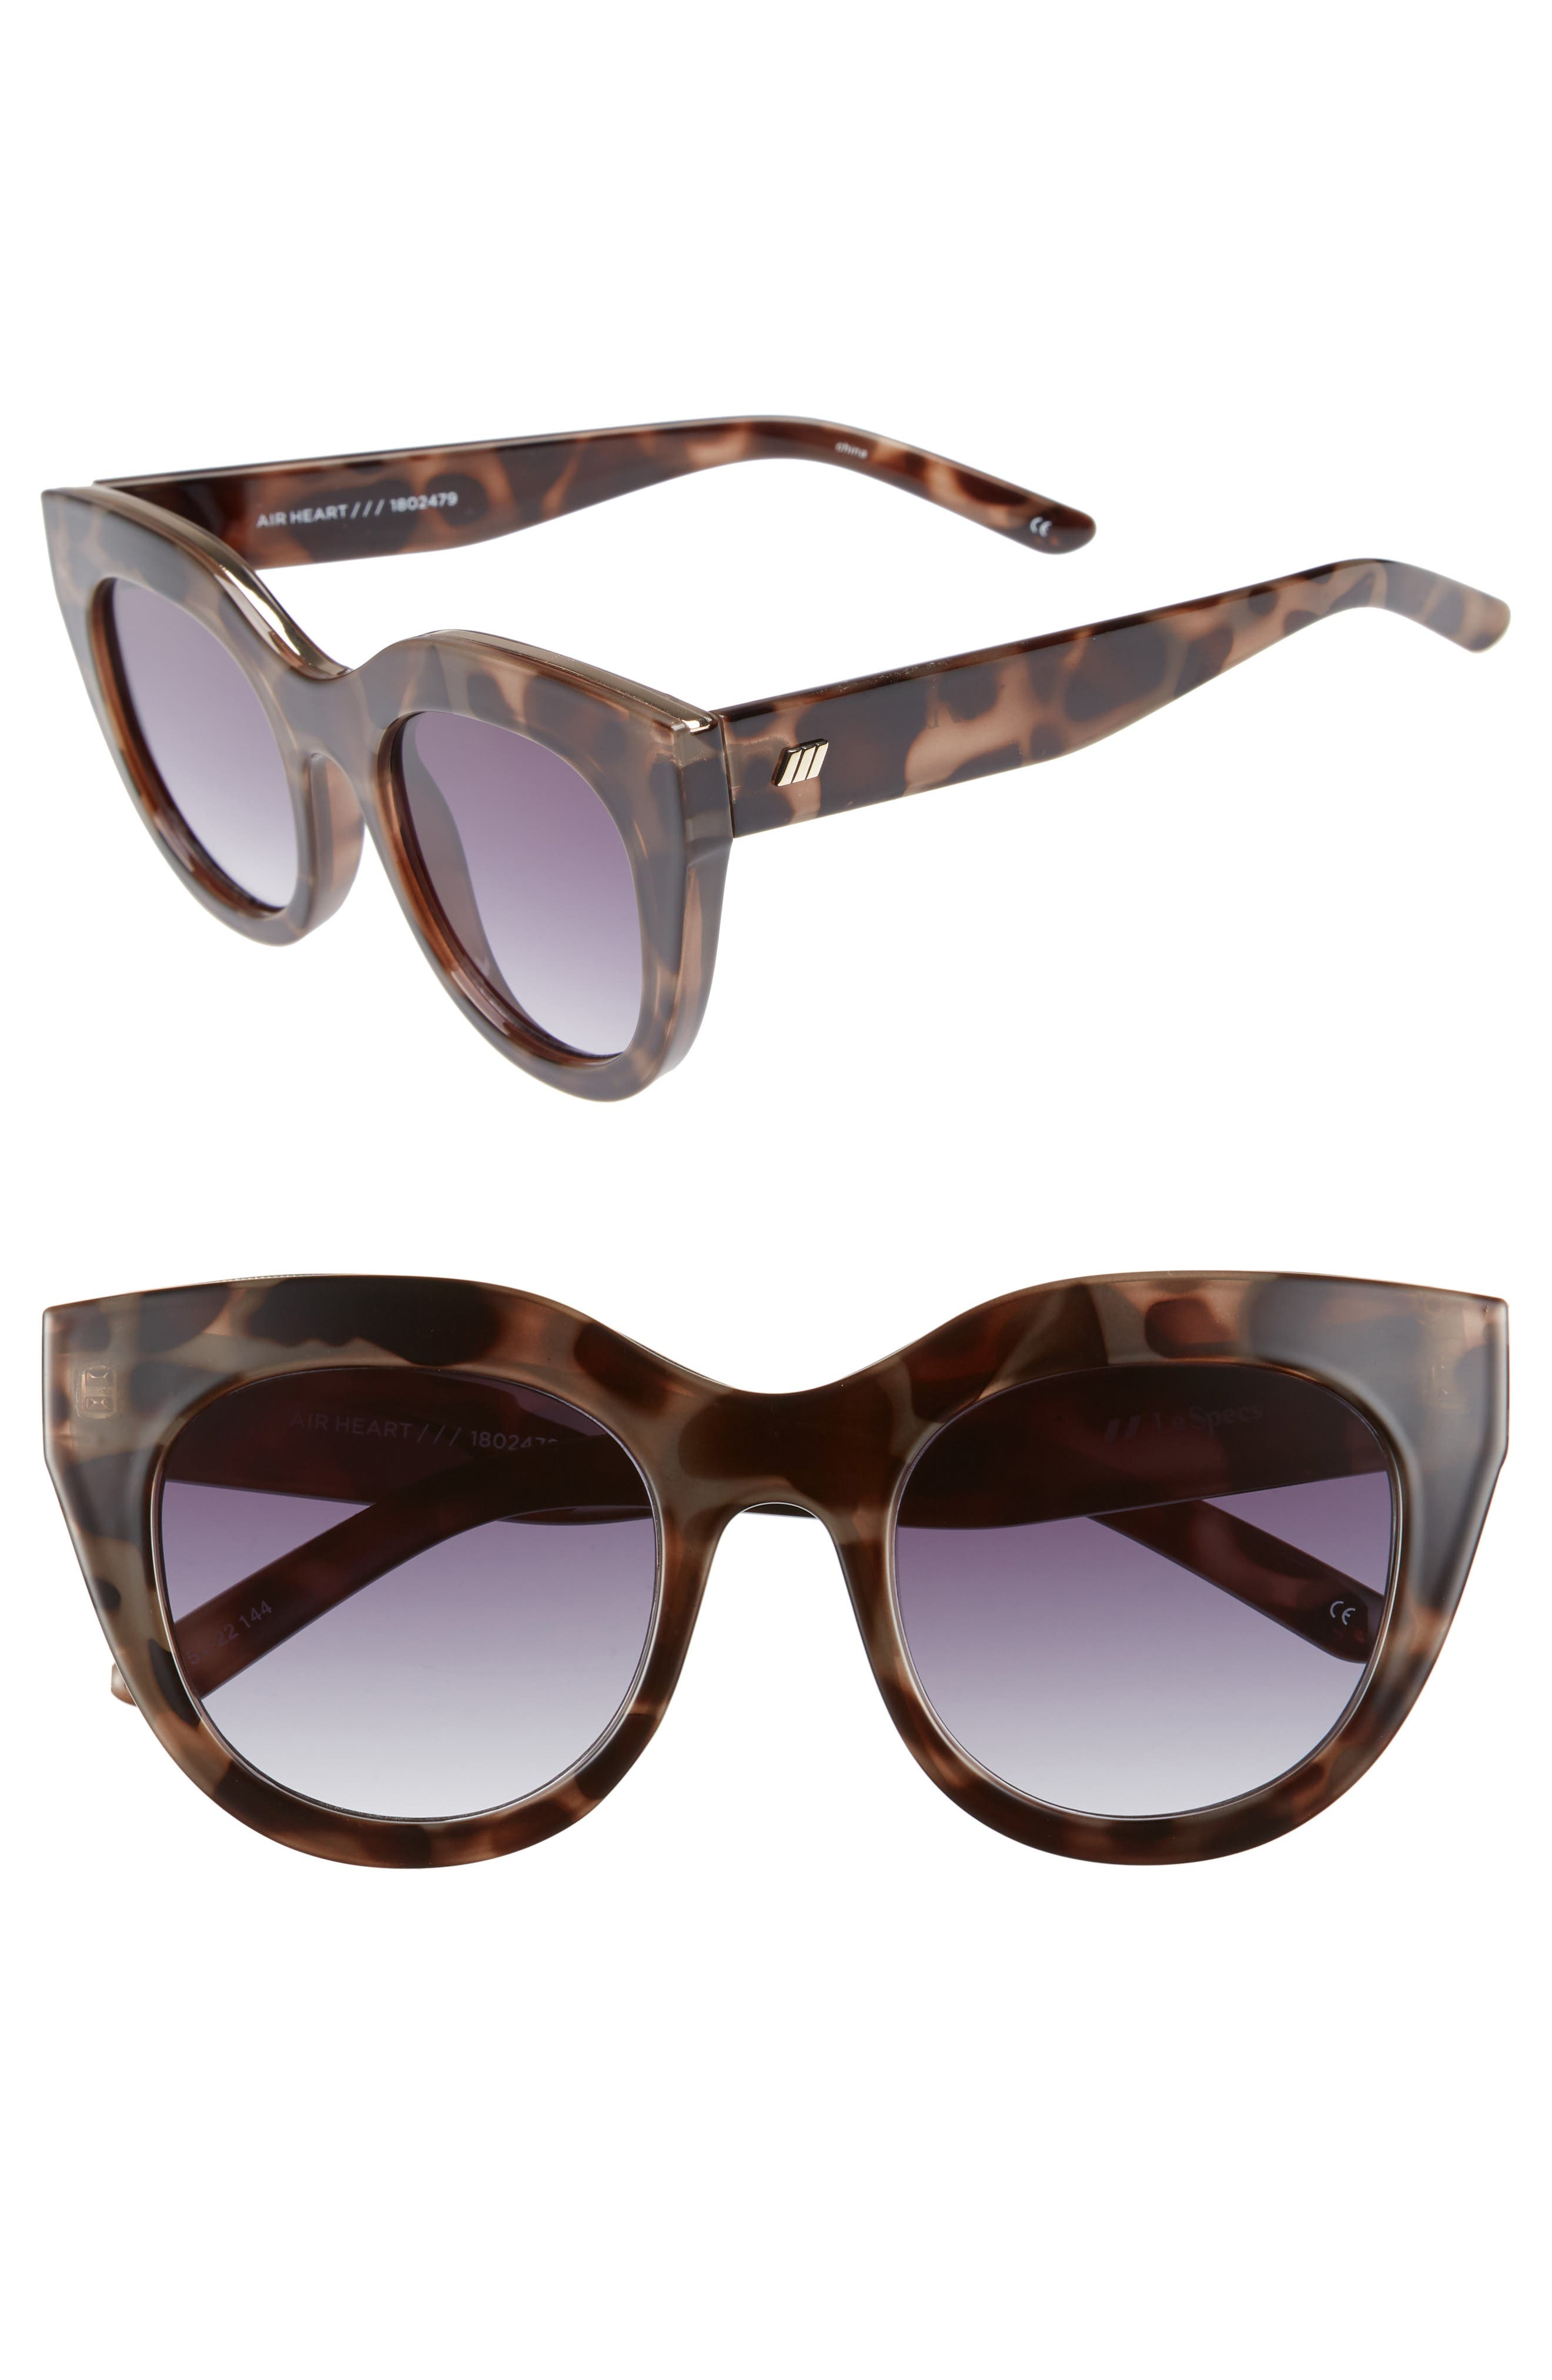 Air Heart 51mm Cat Eye Sunglasses,                             Main thumbnail 1, color,                             VOLCANIC TORTOISE